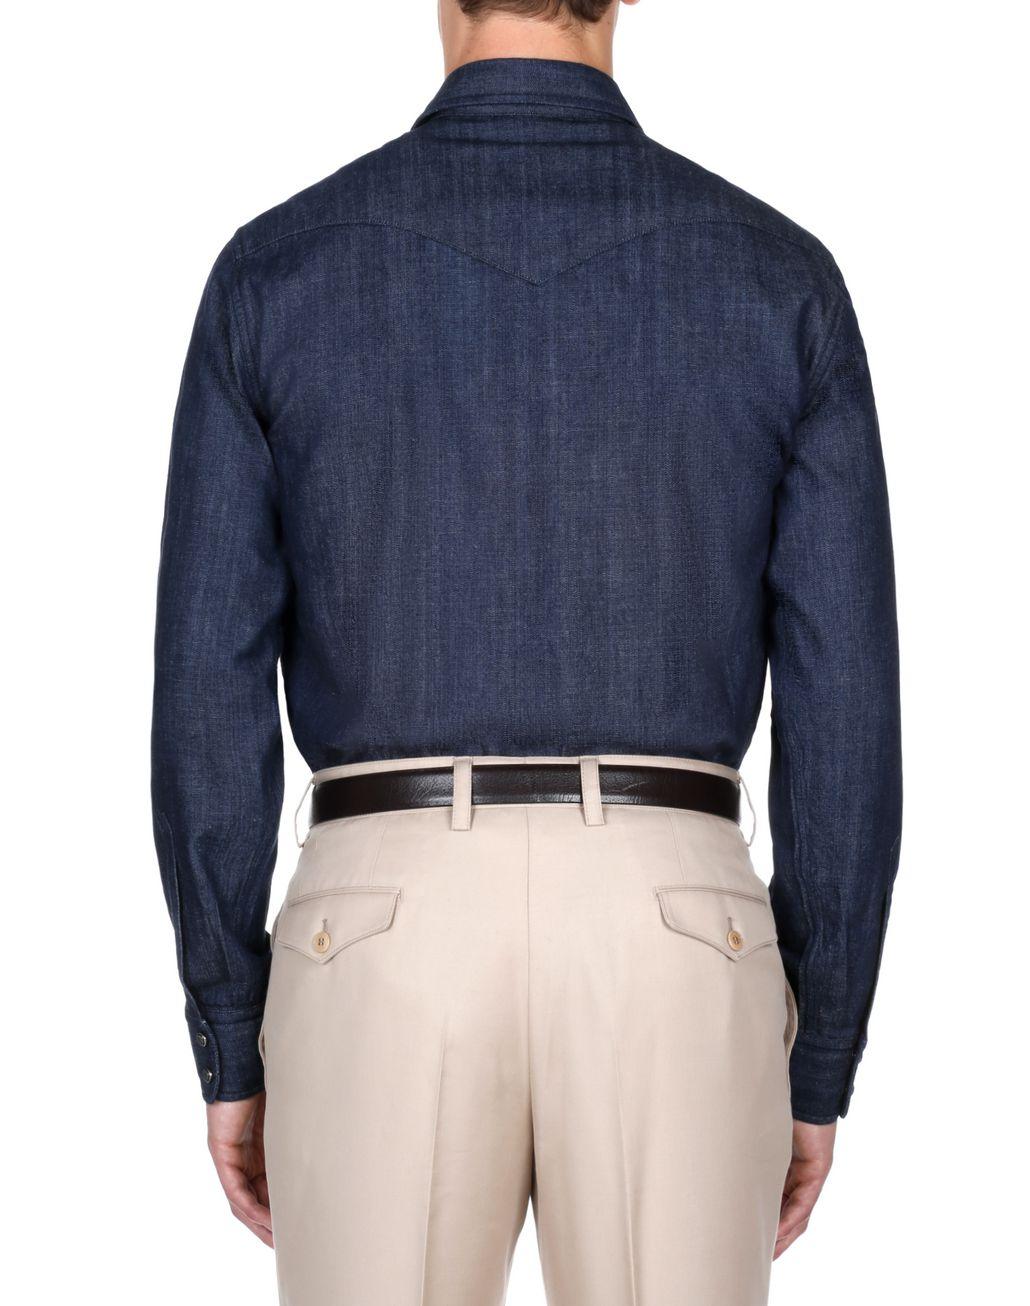 BRIONI Тёмно-синяя джинсовая рубашка Pубашка Для Мужчин d